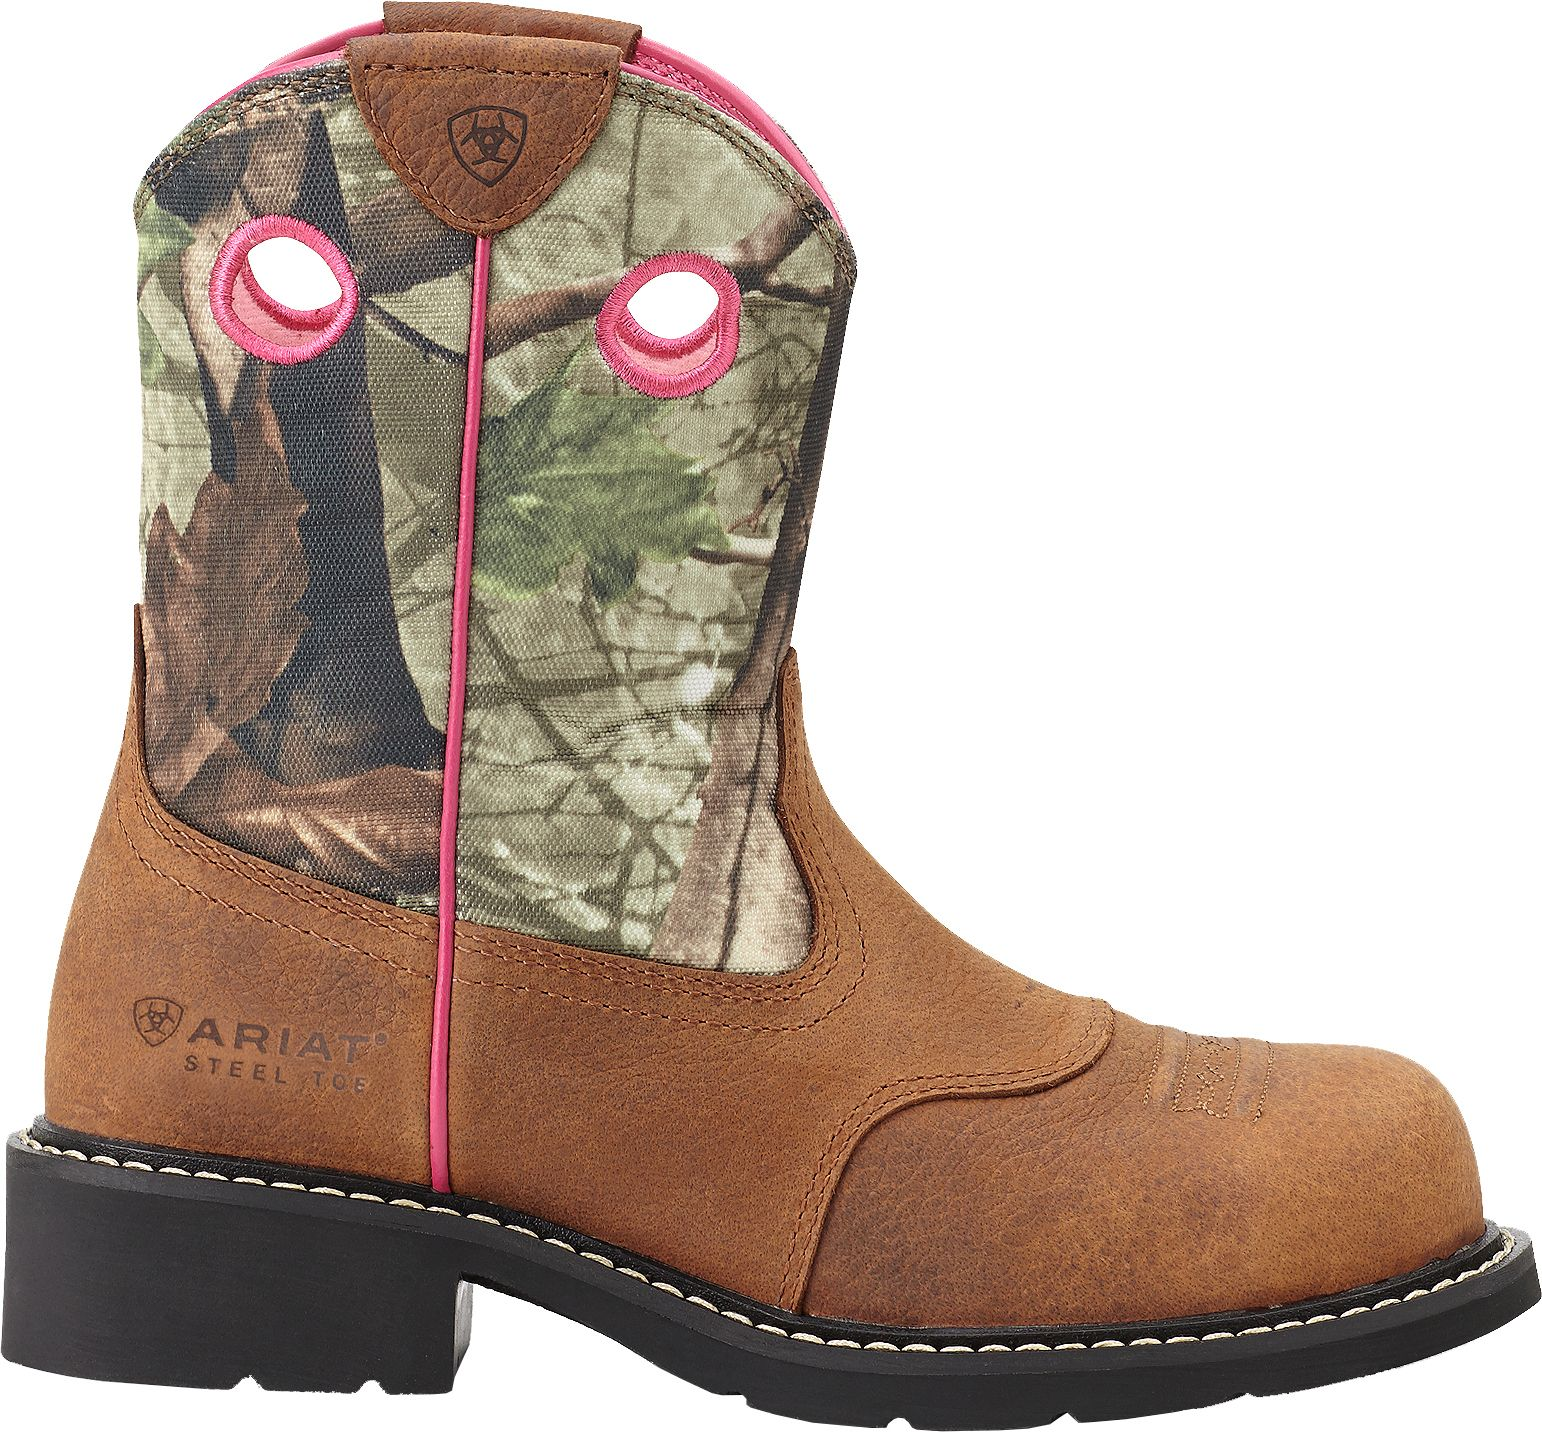 Ariat Women's Fatbaby Camo Steel Toe Western Boots | DICK'S ...